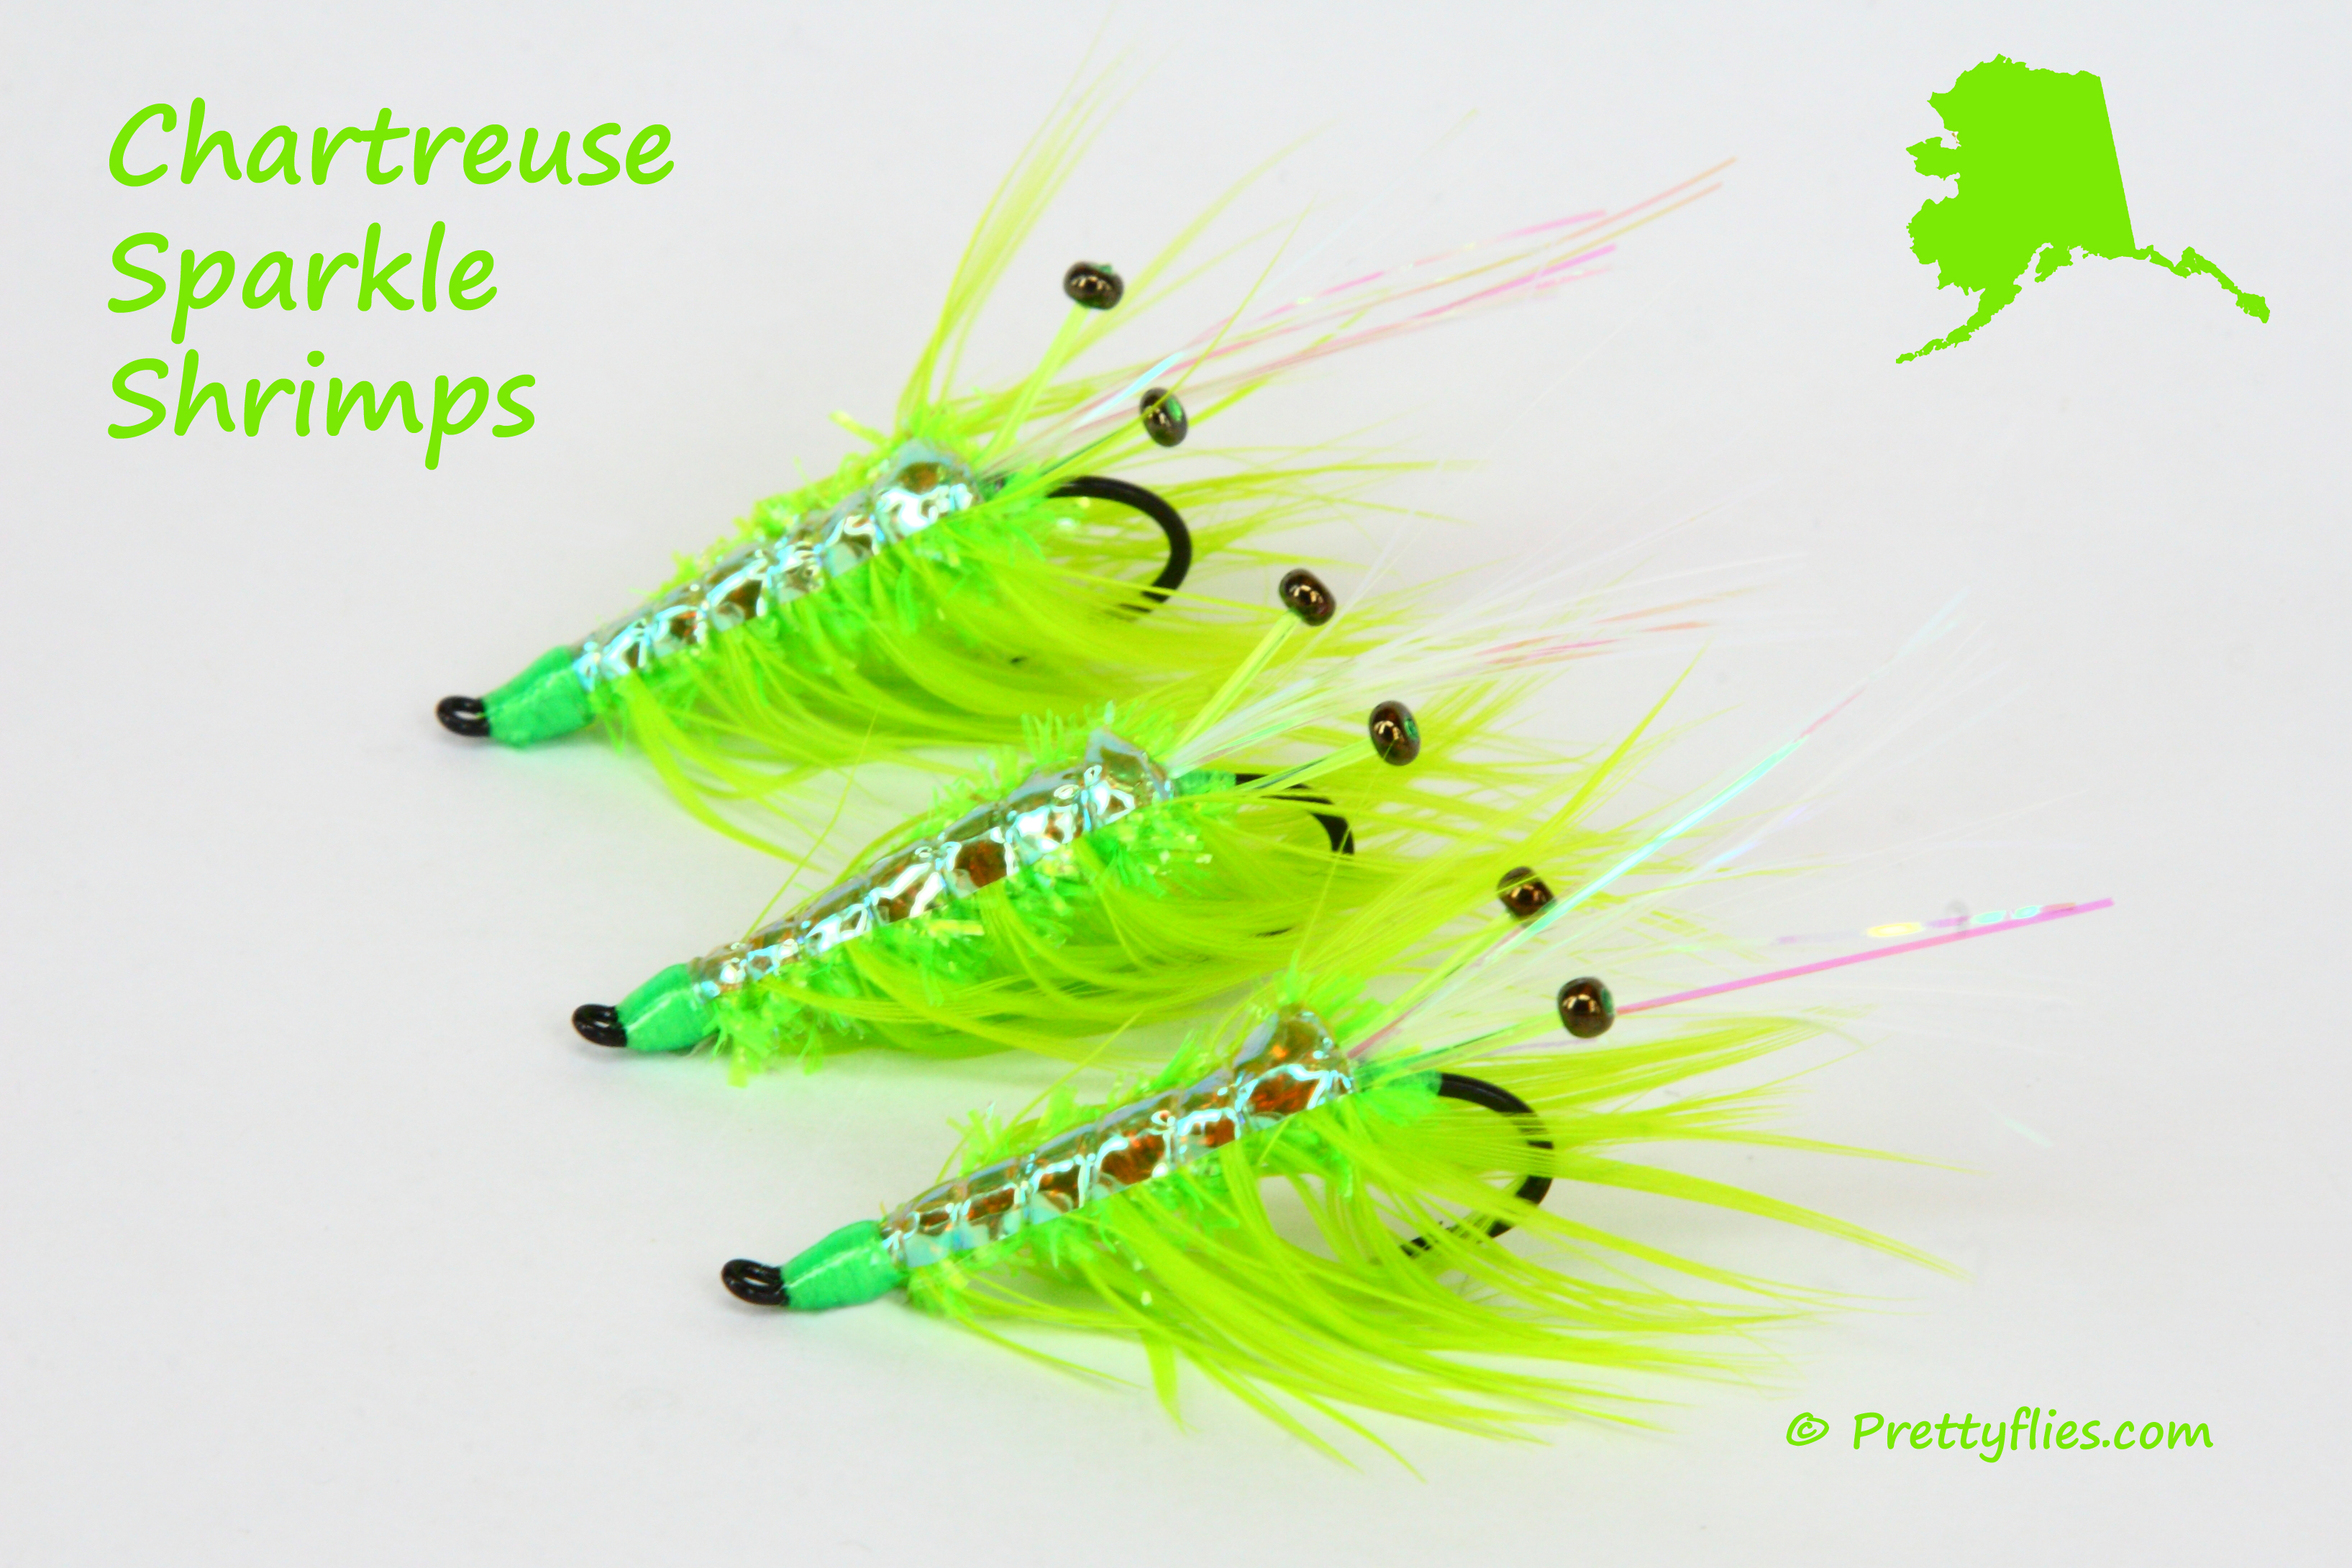 Chartreuse Sparkle Shrimps.jpg